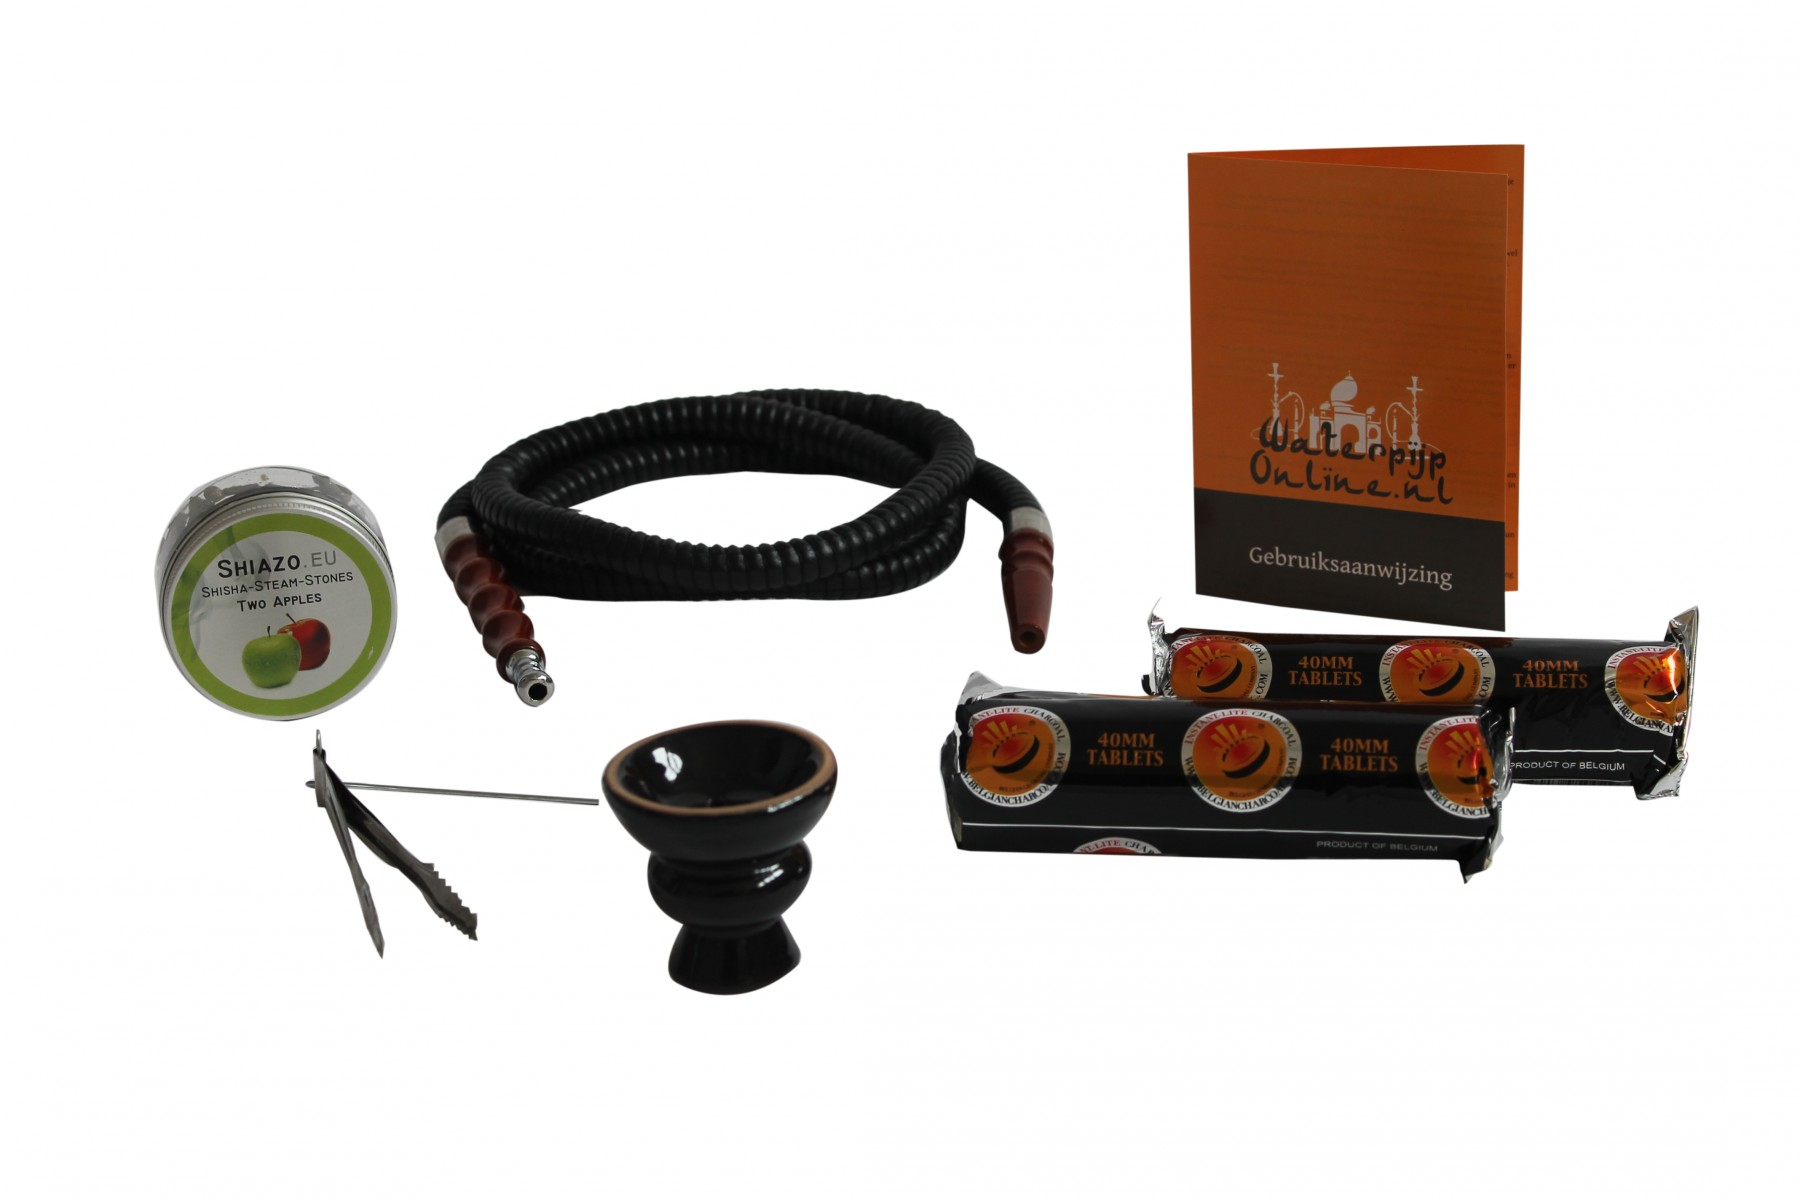 starterspakket Luxor accessoires